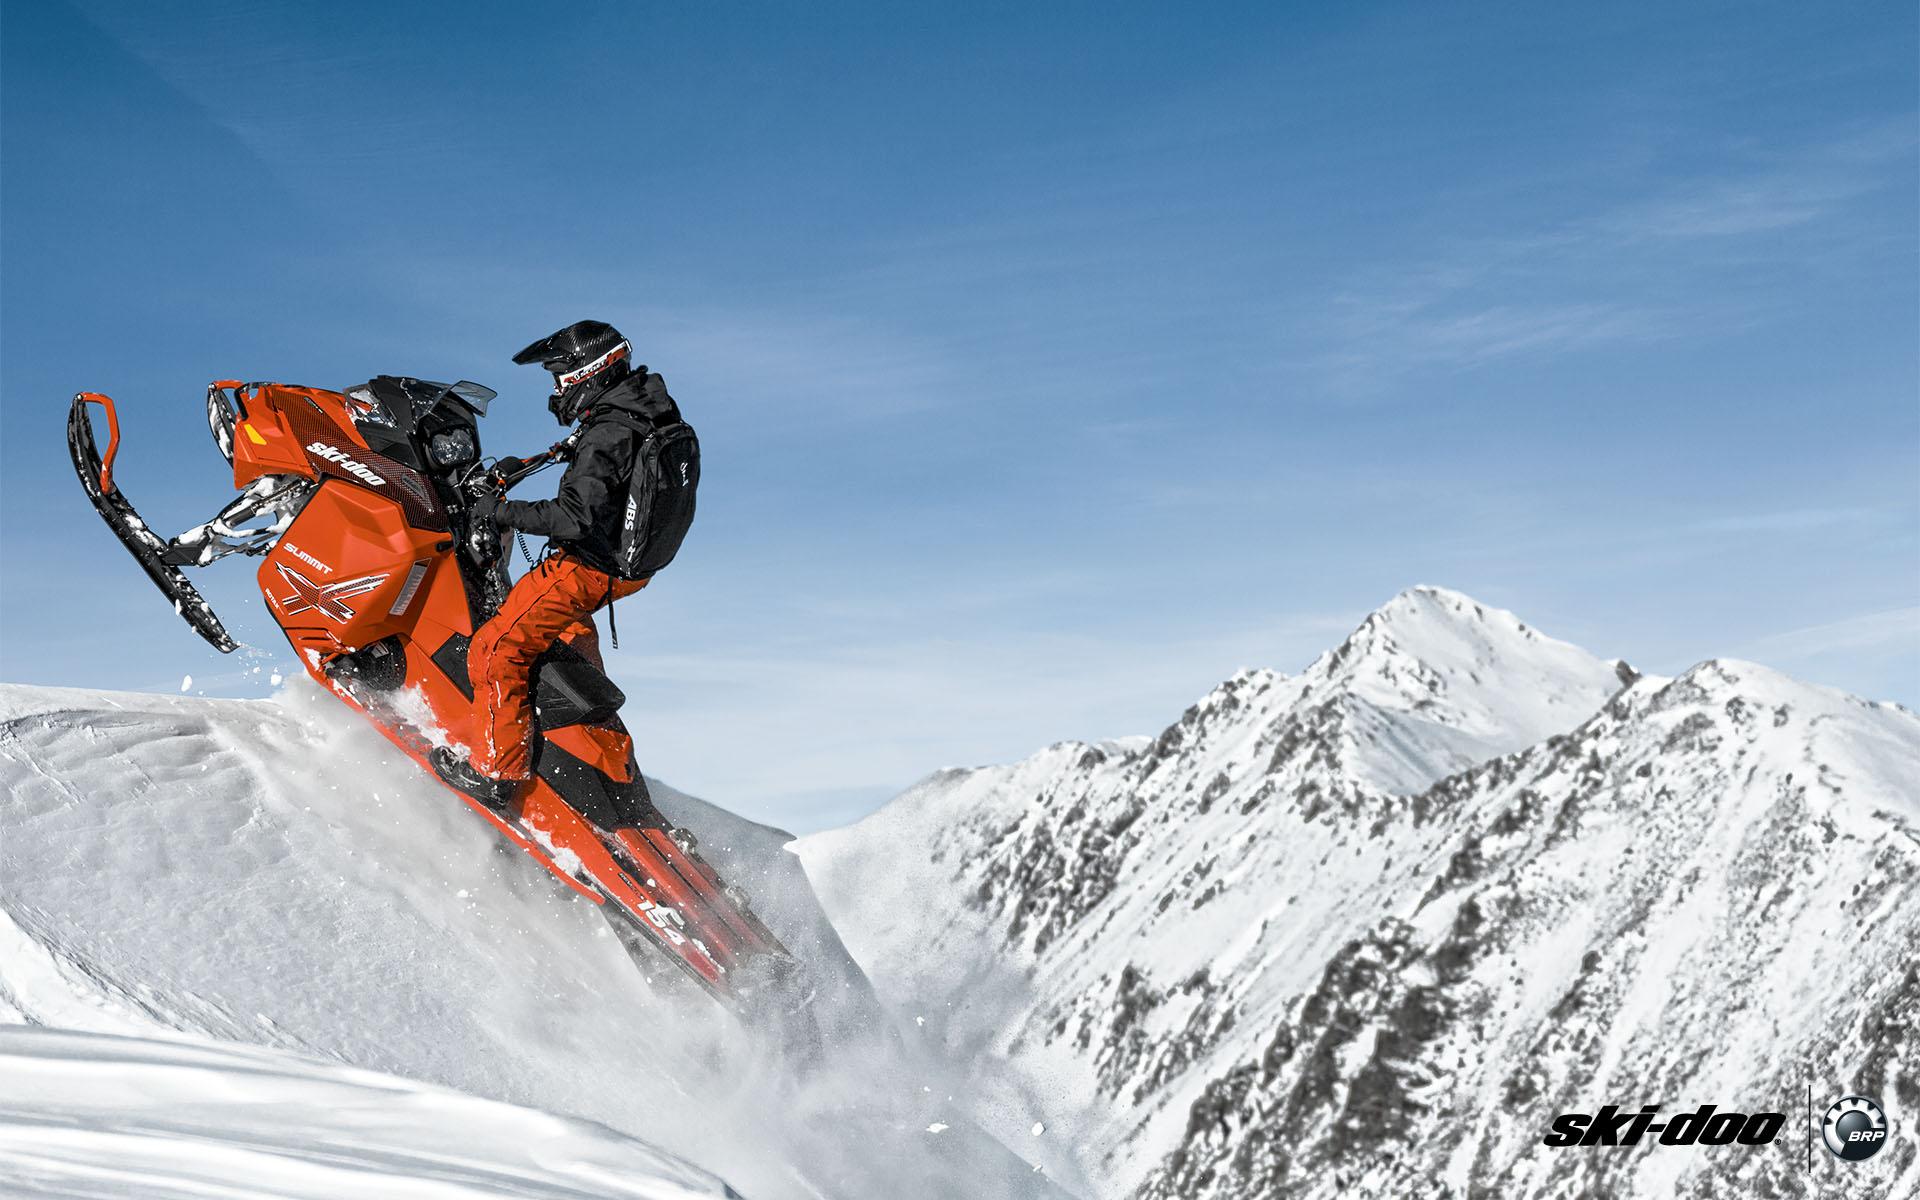 Характеристики спортивных снегоходов